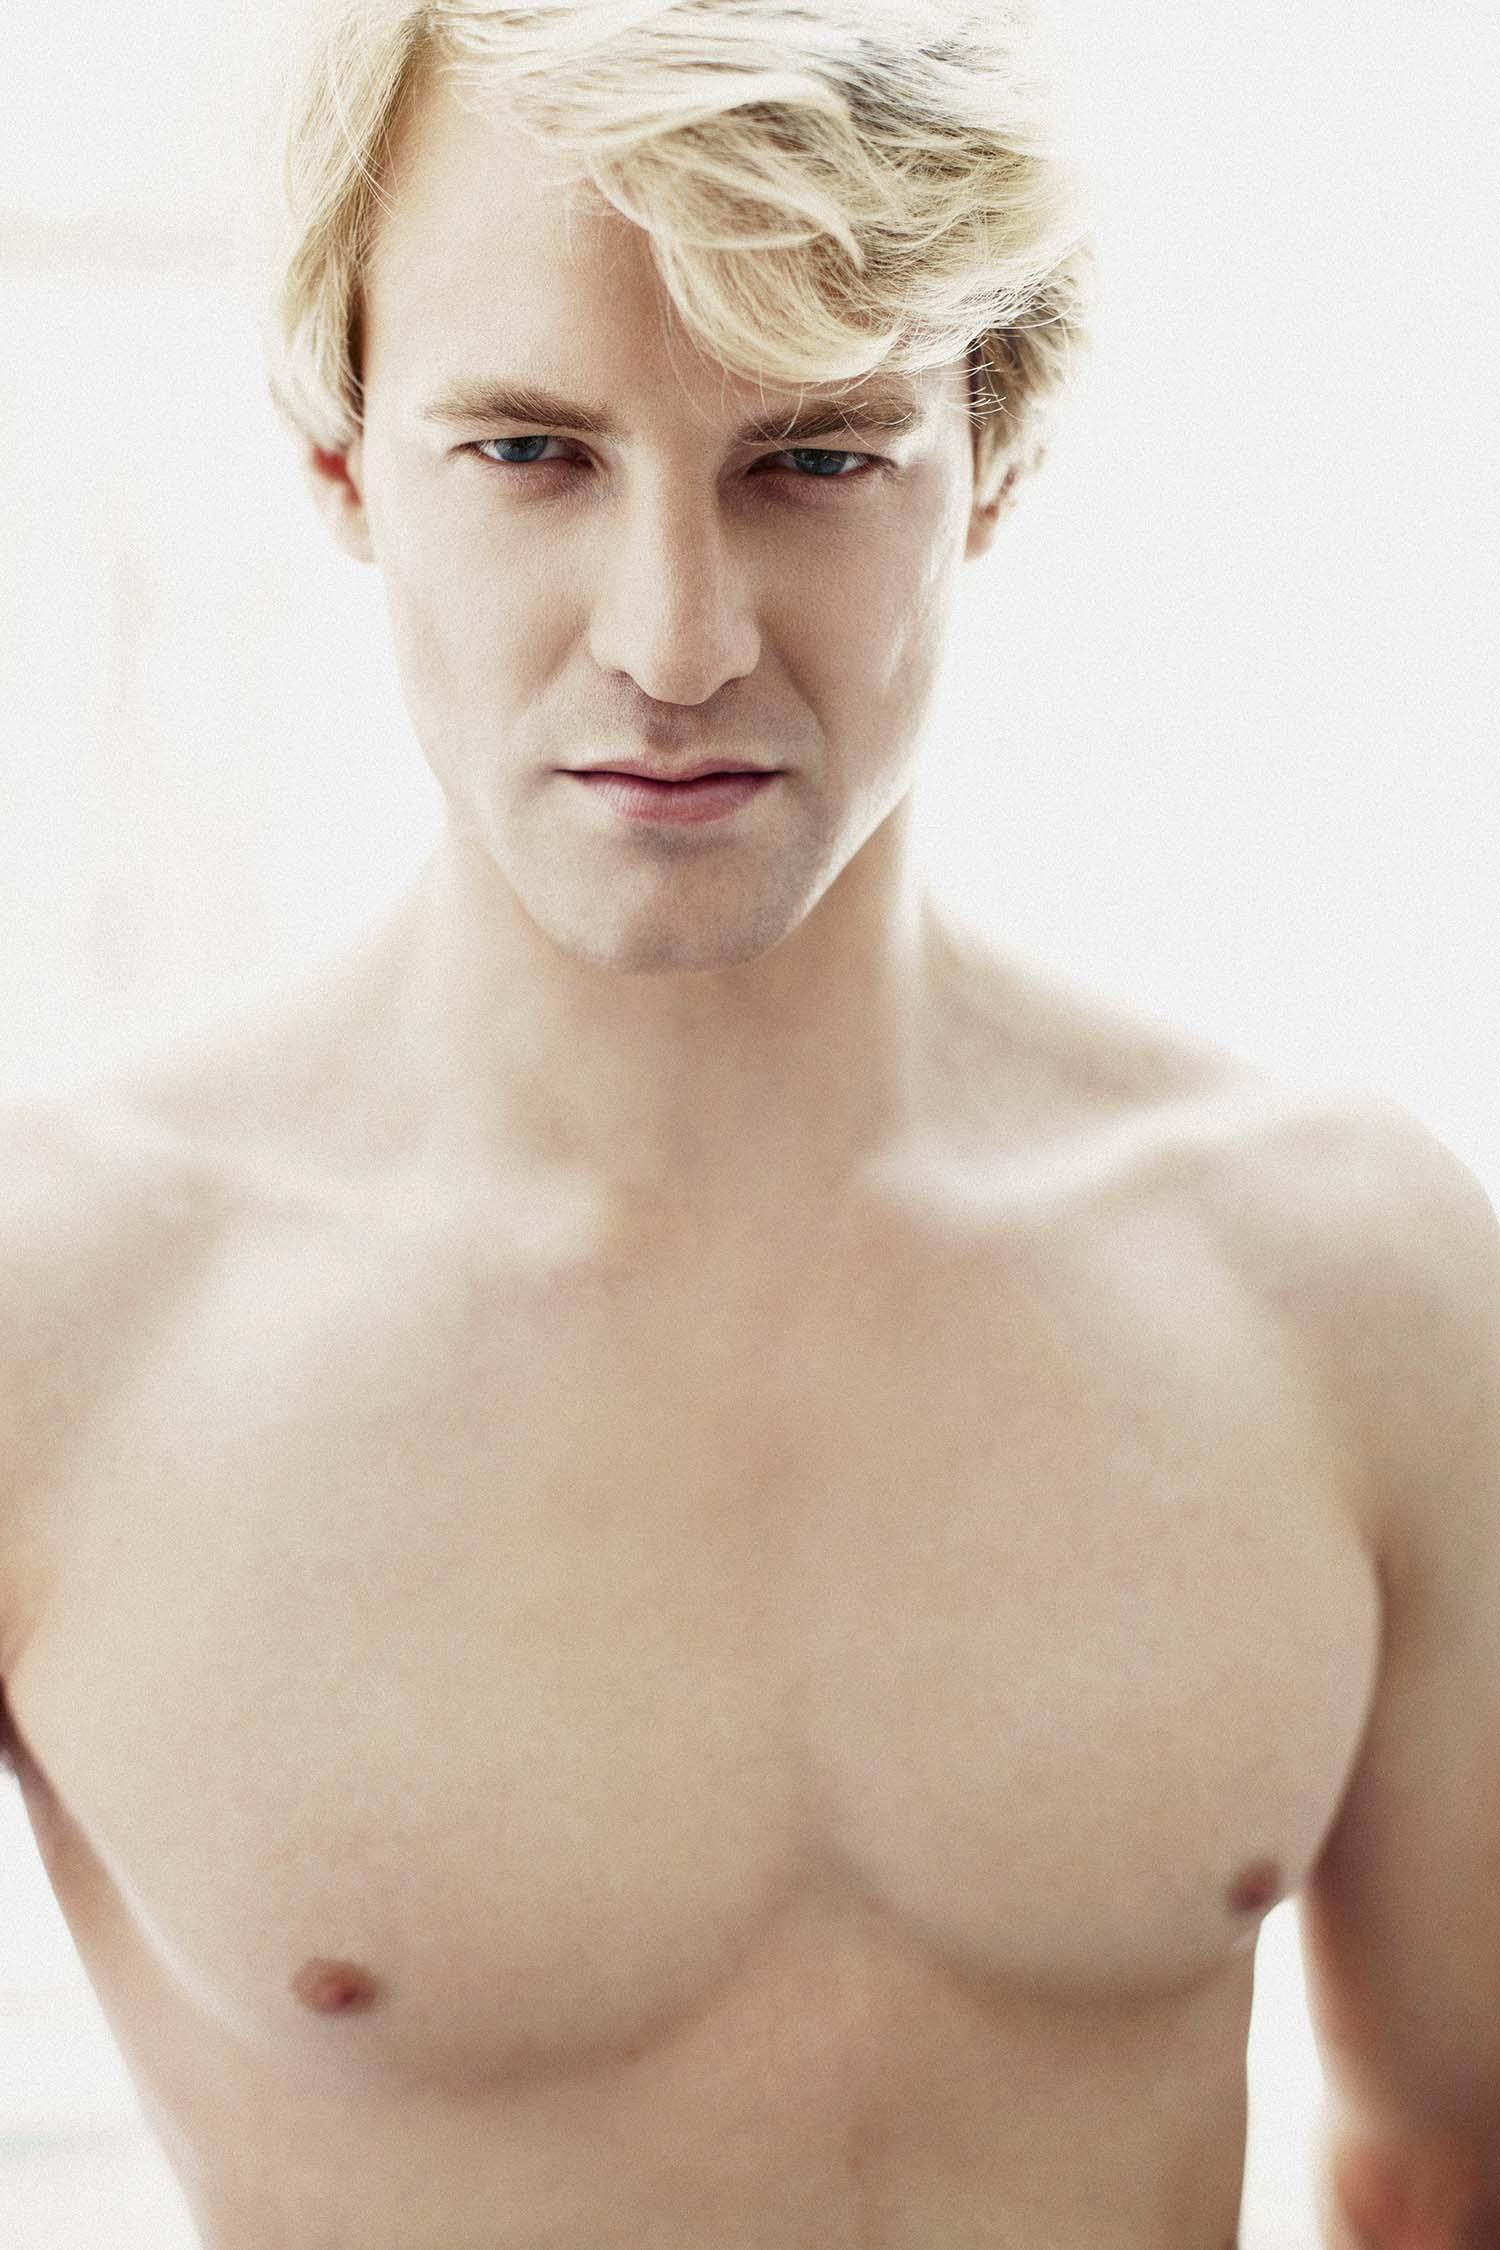 nyc-photographers-male-model-test-10002.jpg